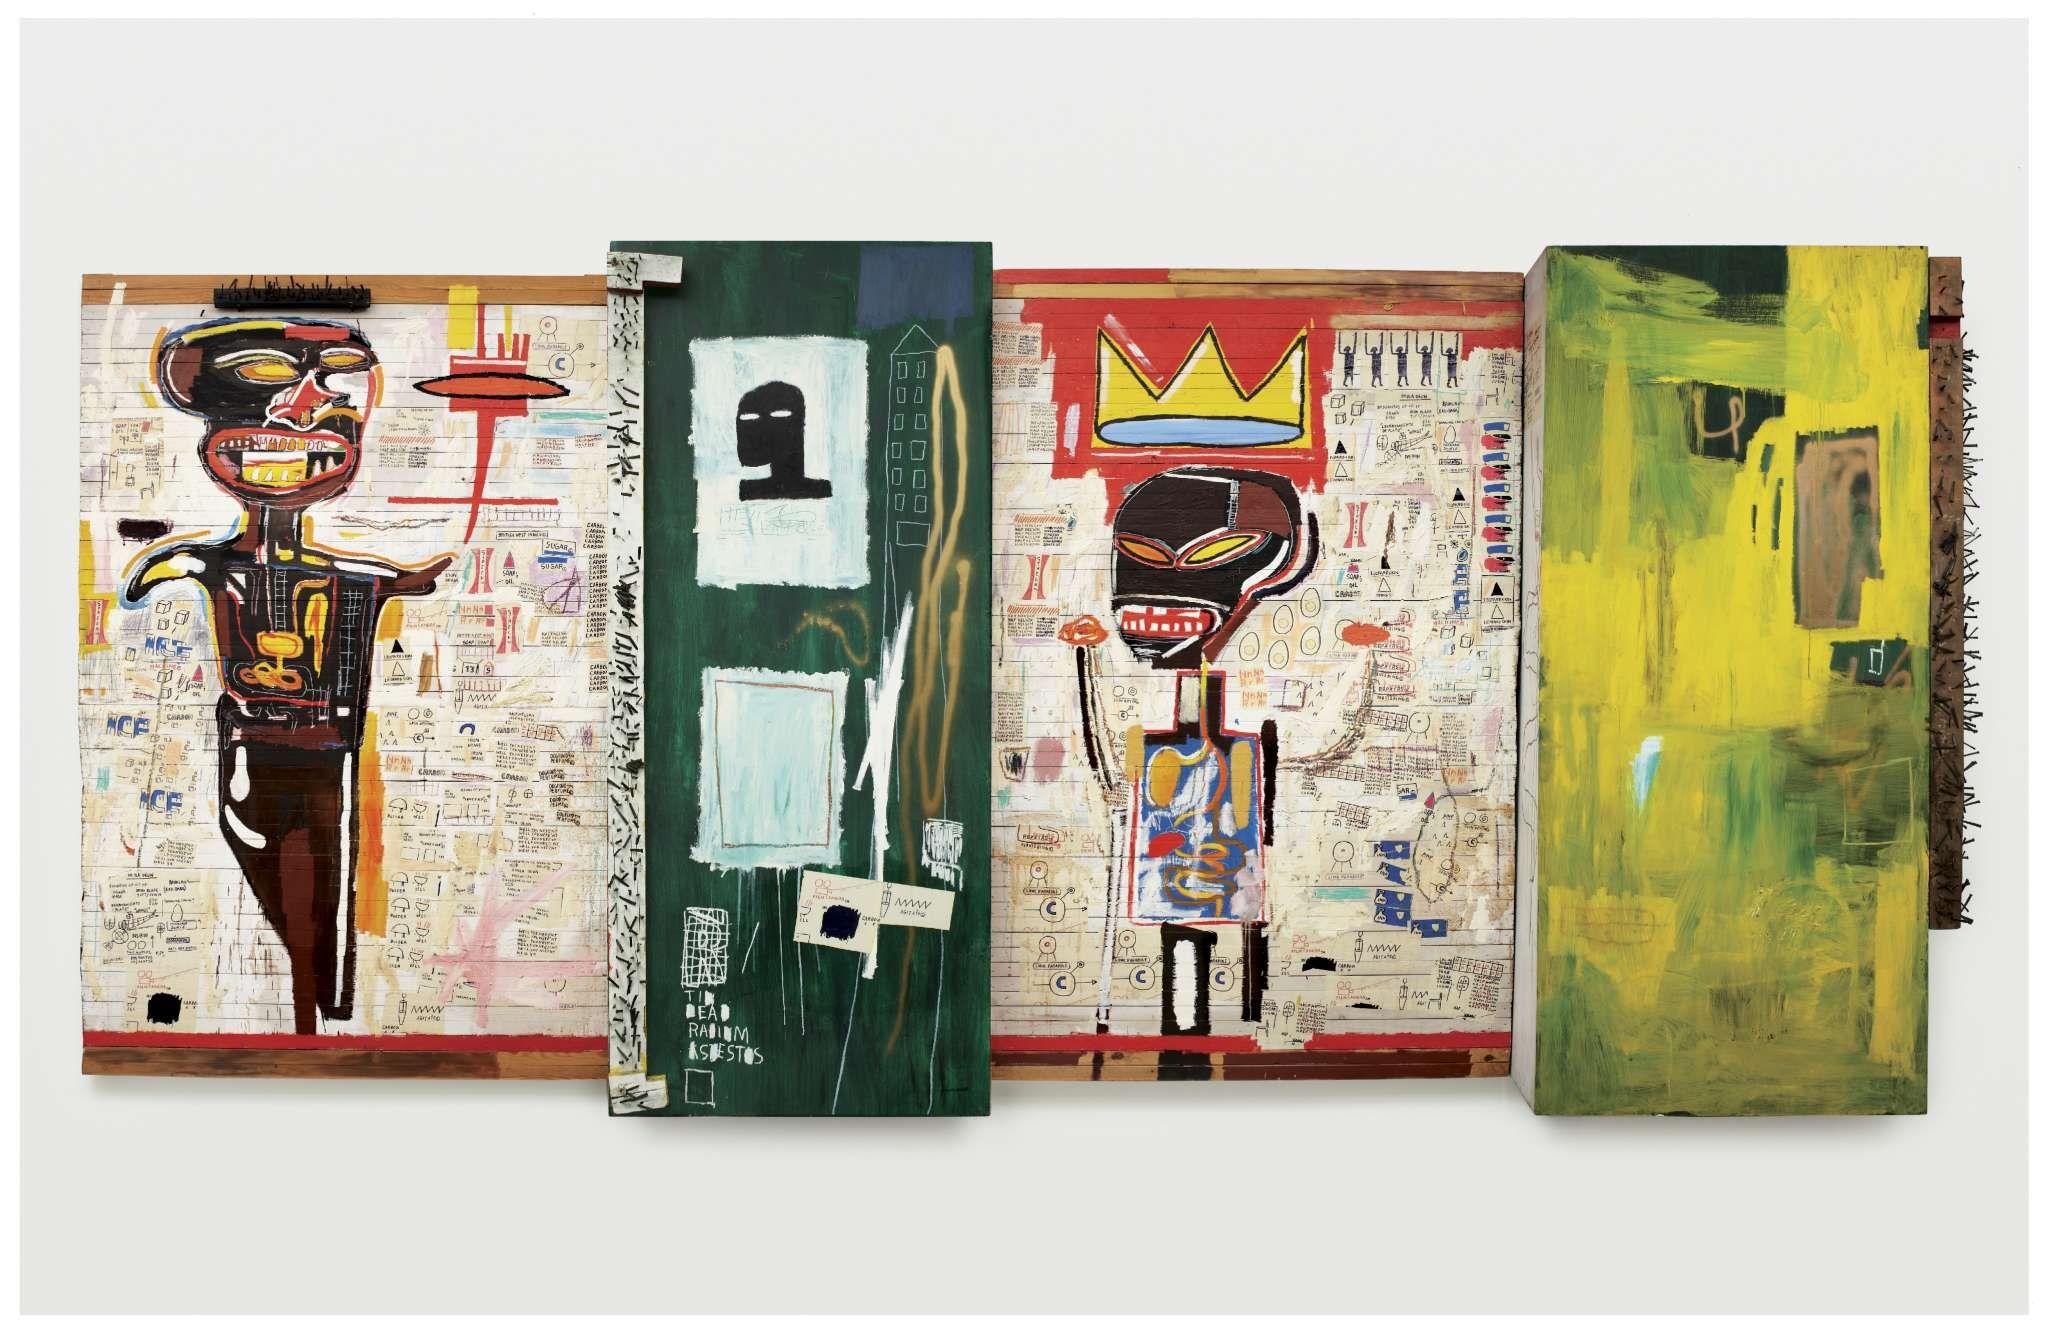 © Estate of Jean-Michel Basquiat Licensed by Artestar, New York © Fondation Louis Vuitton / Marc Domage